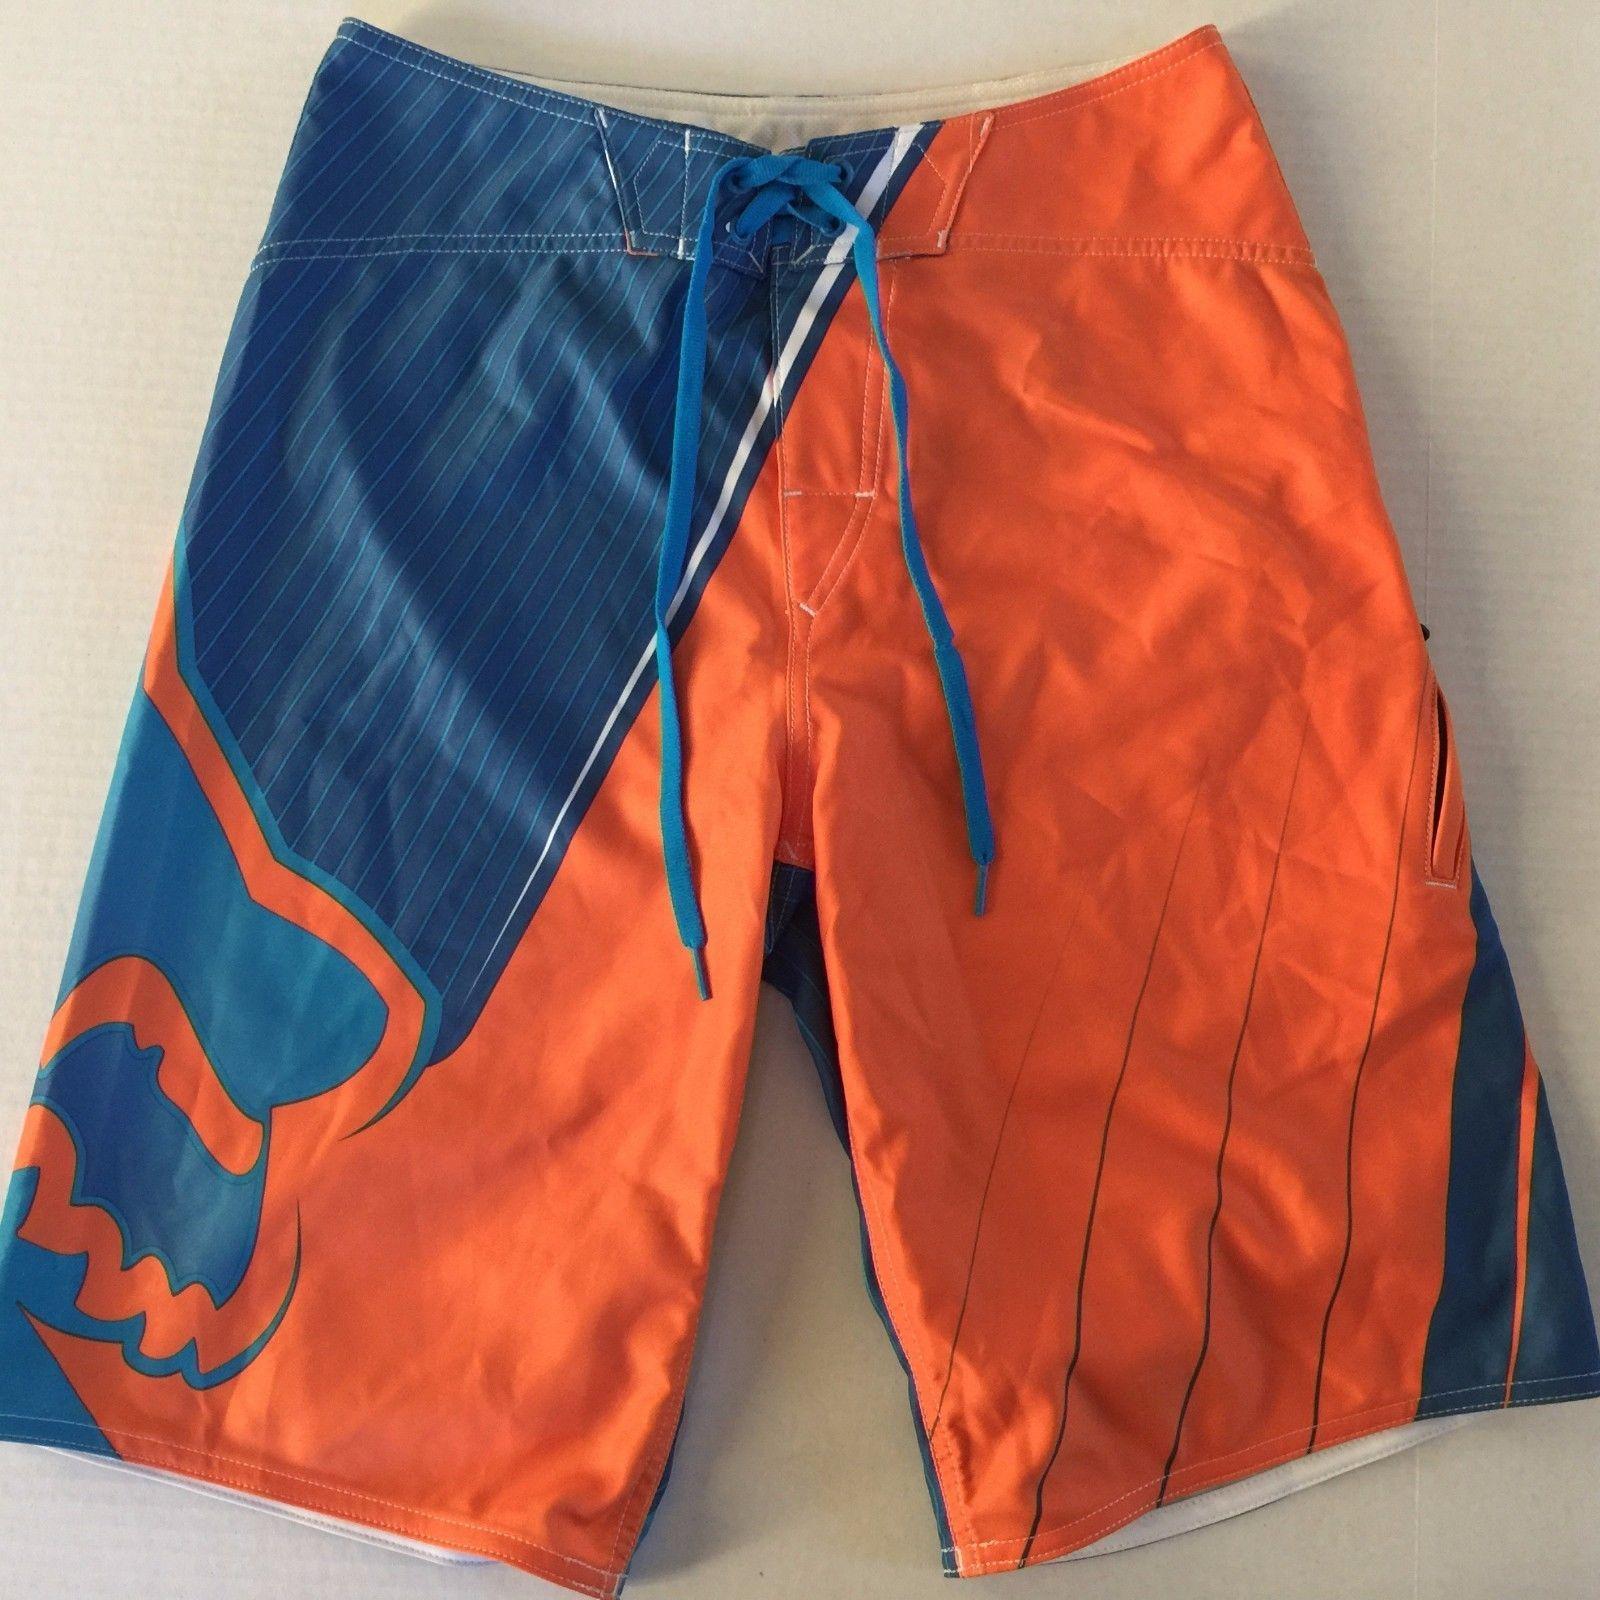 Men's Fox Tech Board Shorts Swim NEW WITHOUT TAGS • CAD 37.82 - PicClick CA